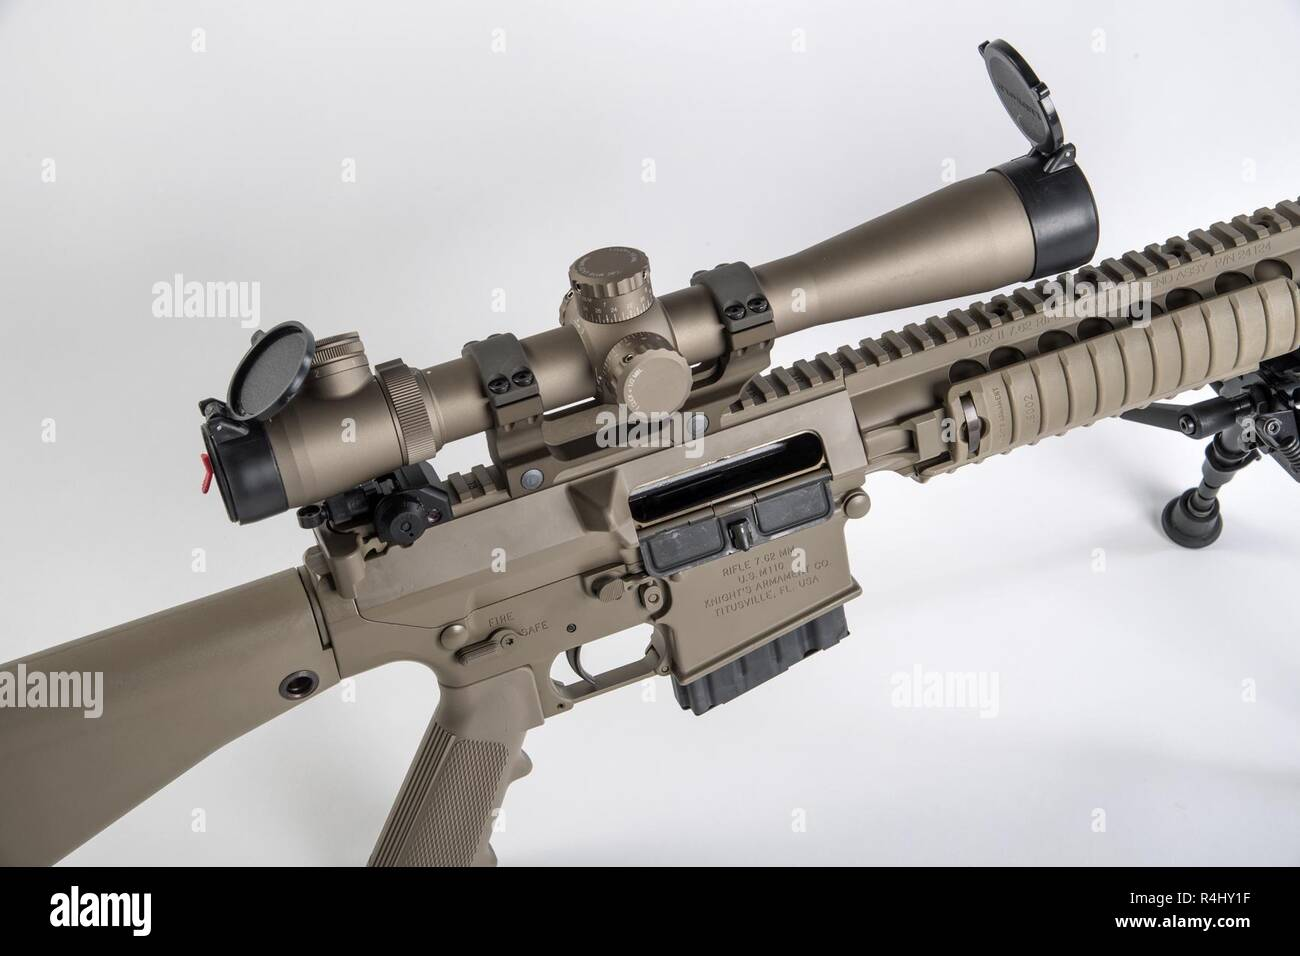 Semi Automatic Sniper Rifle Stock Photos & Semi Automatic